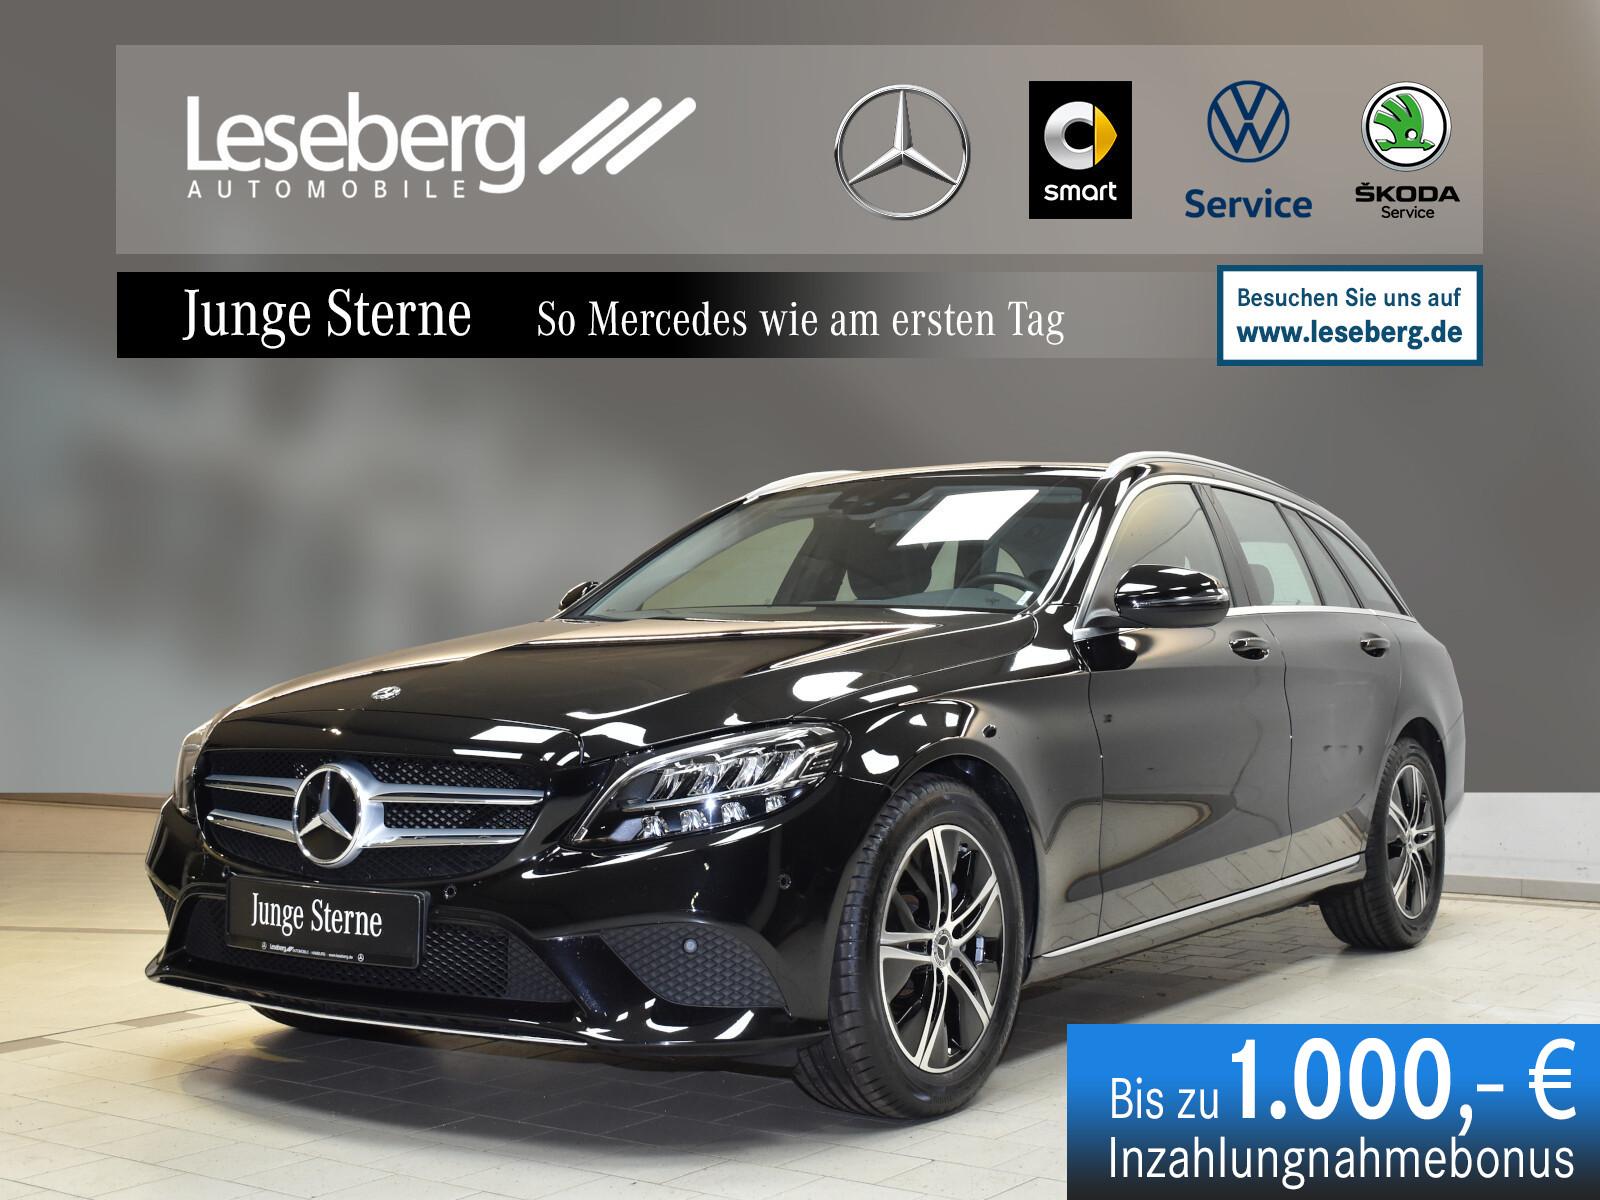 Mercedes-Benz C 180 T Avantgarde/Kamera/LED/9G/Navi/Totwinkel, Jahr 2020, Benzin